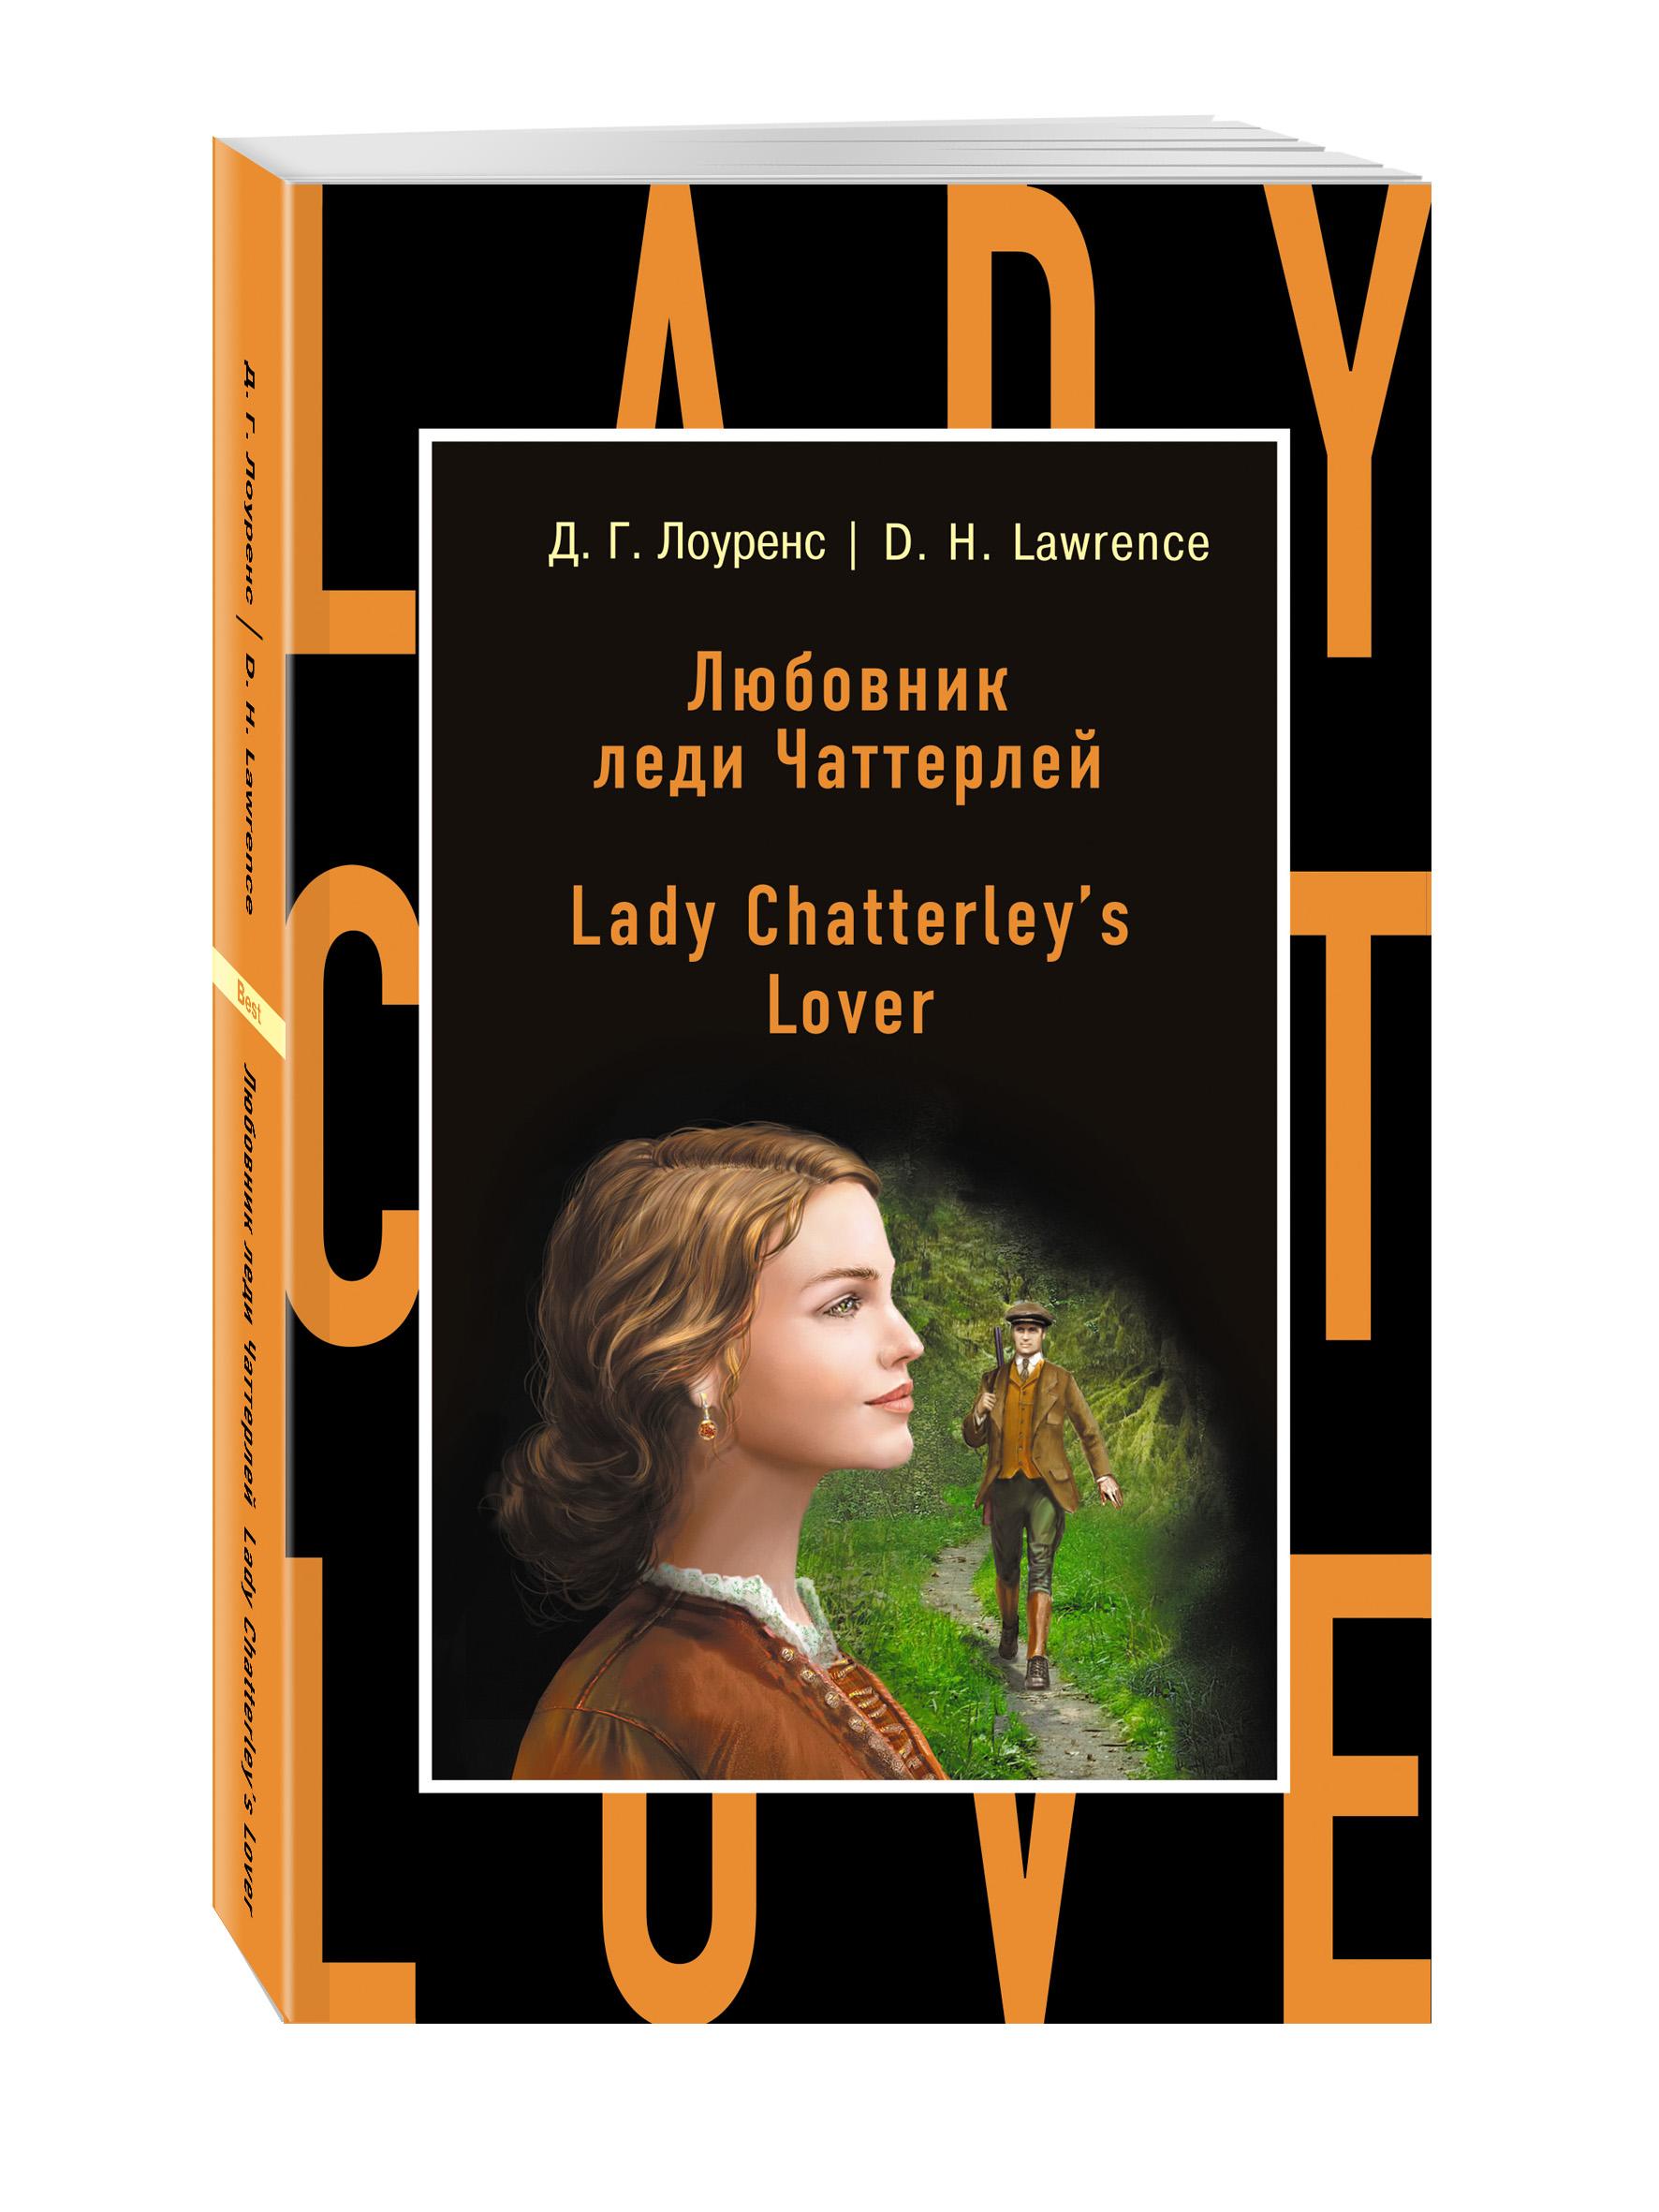 Любовник леди Чаттерлей = Lady Chatterley's Lover